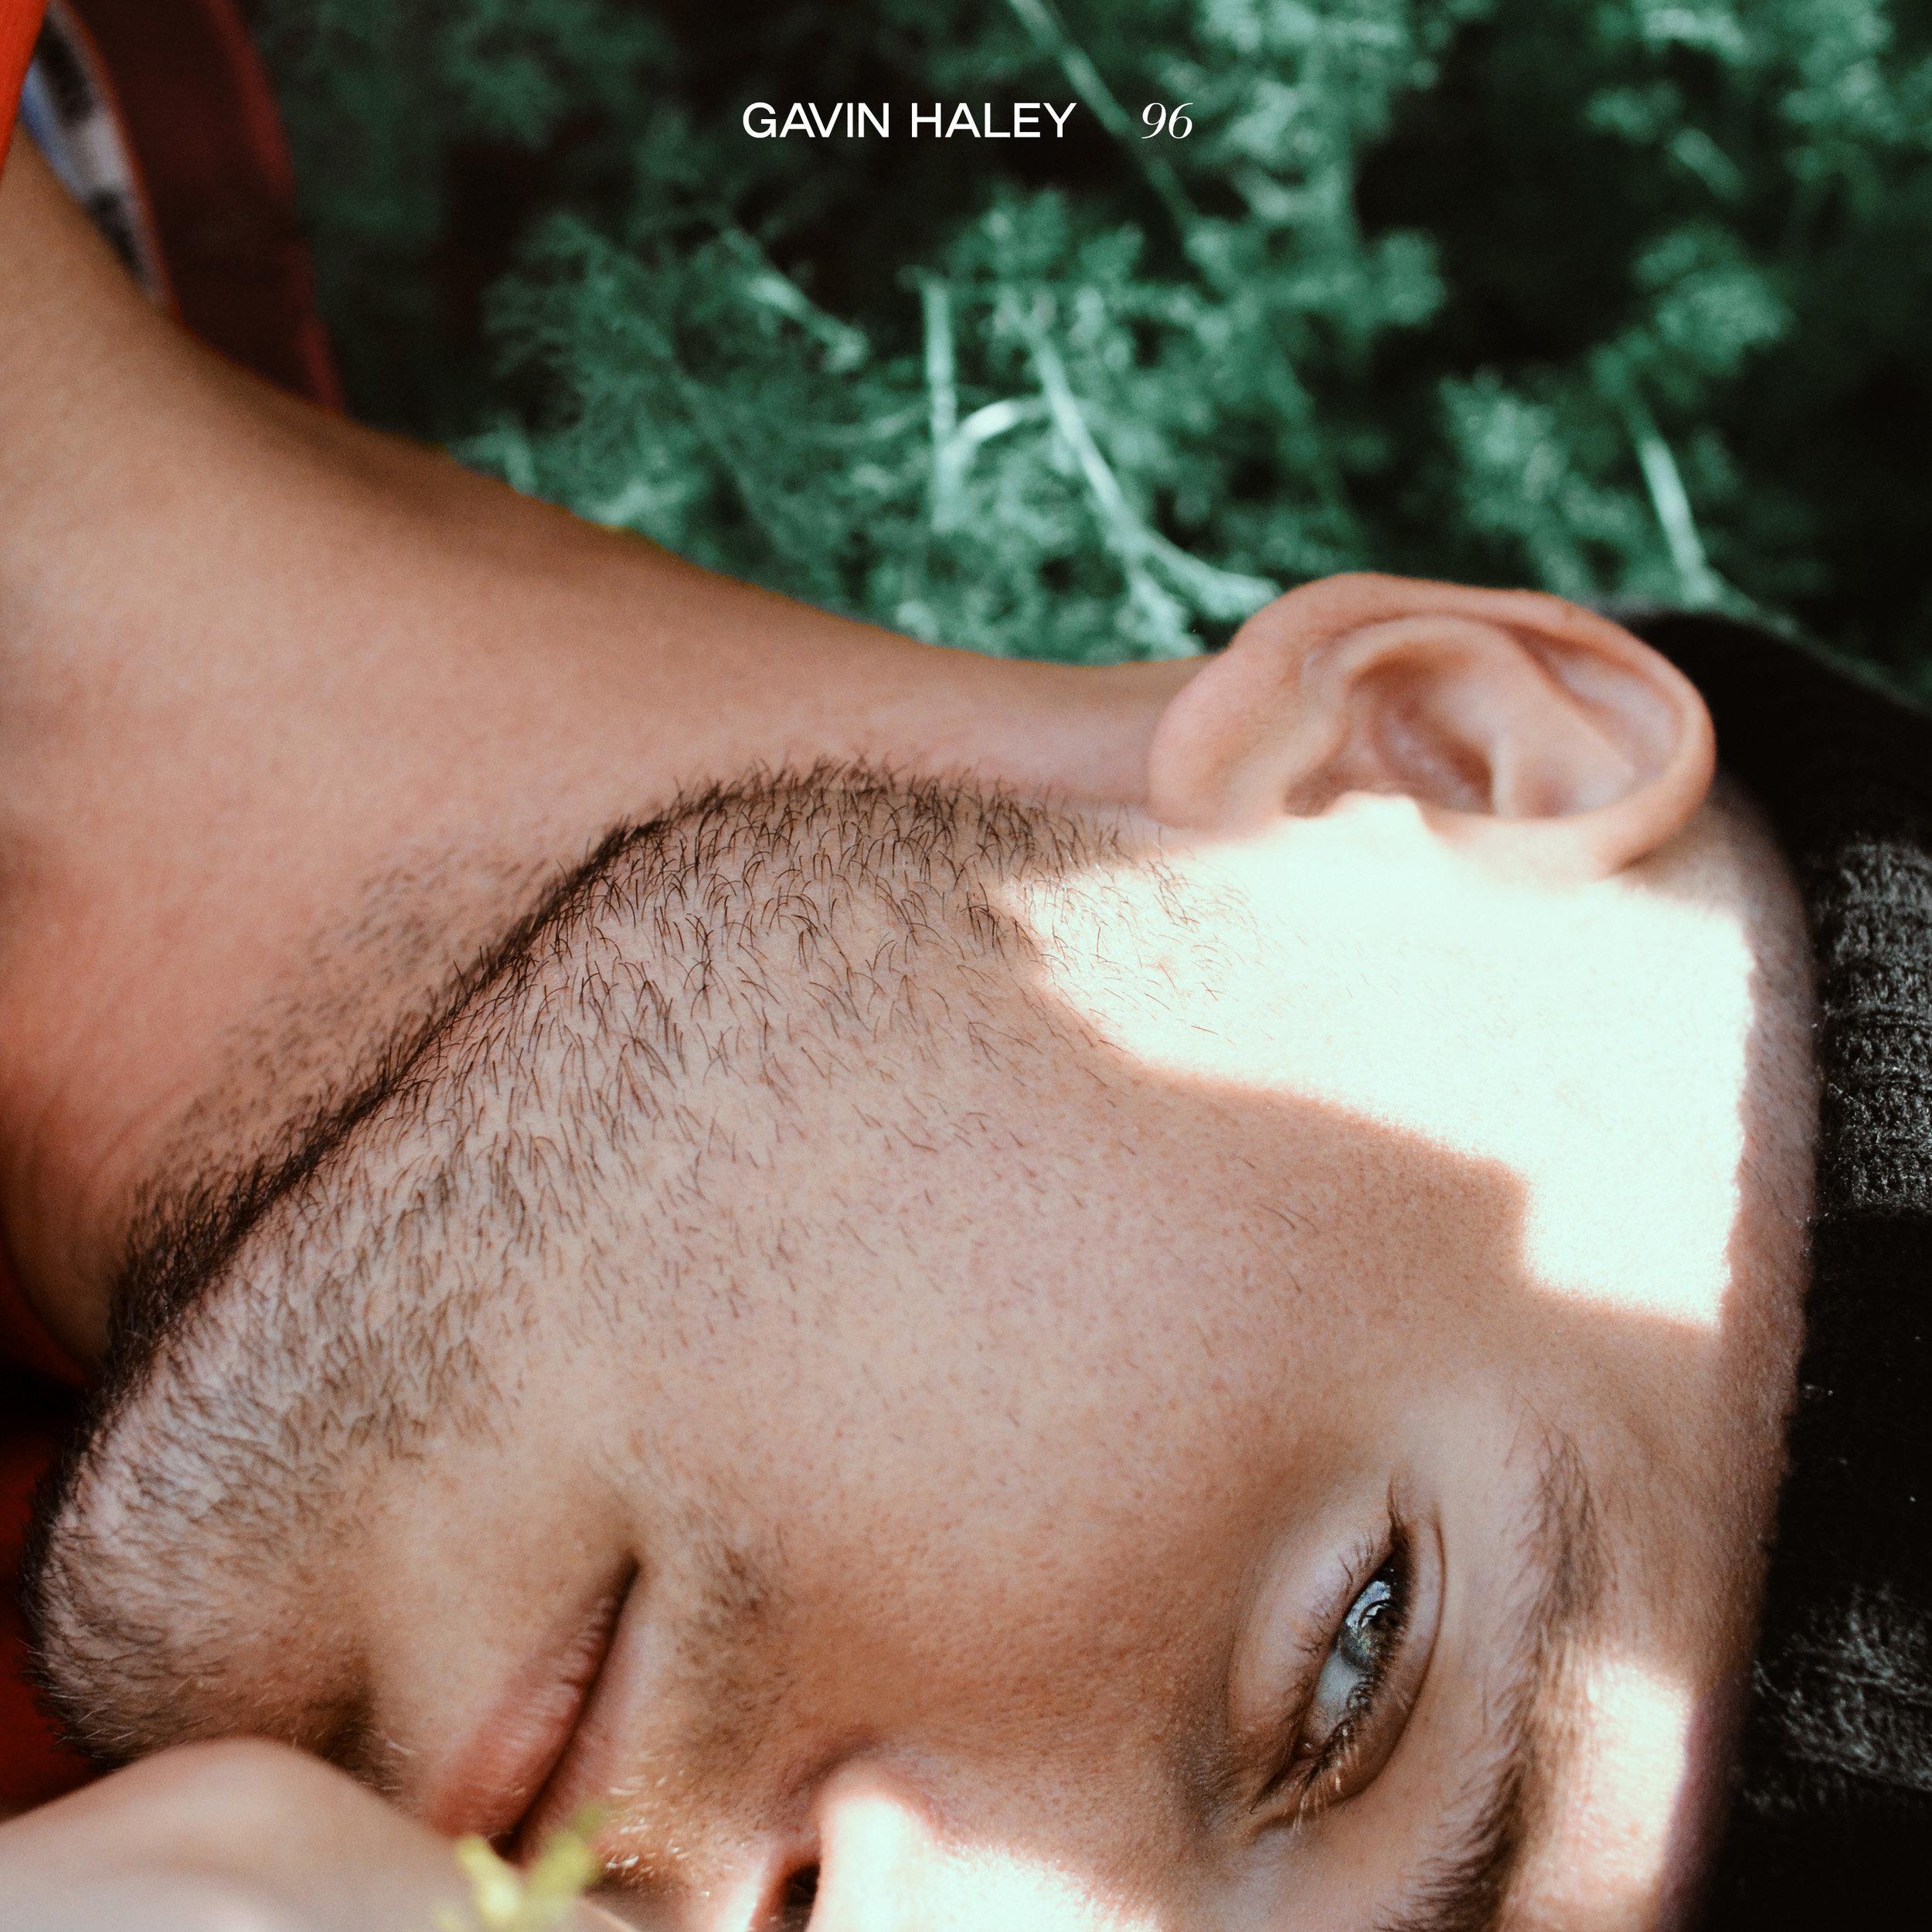 Gavin-Haley-96.jpg